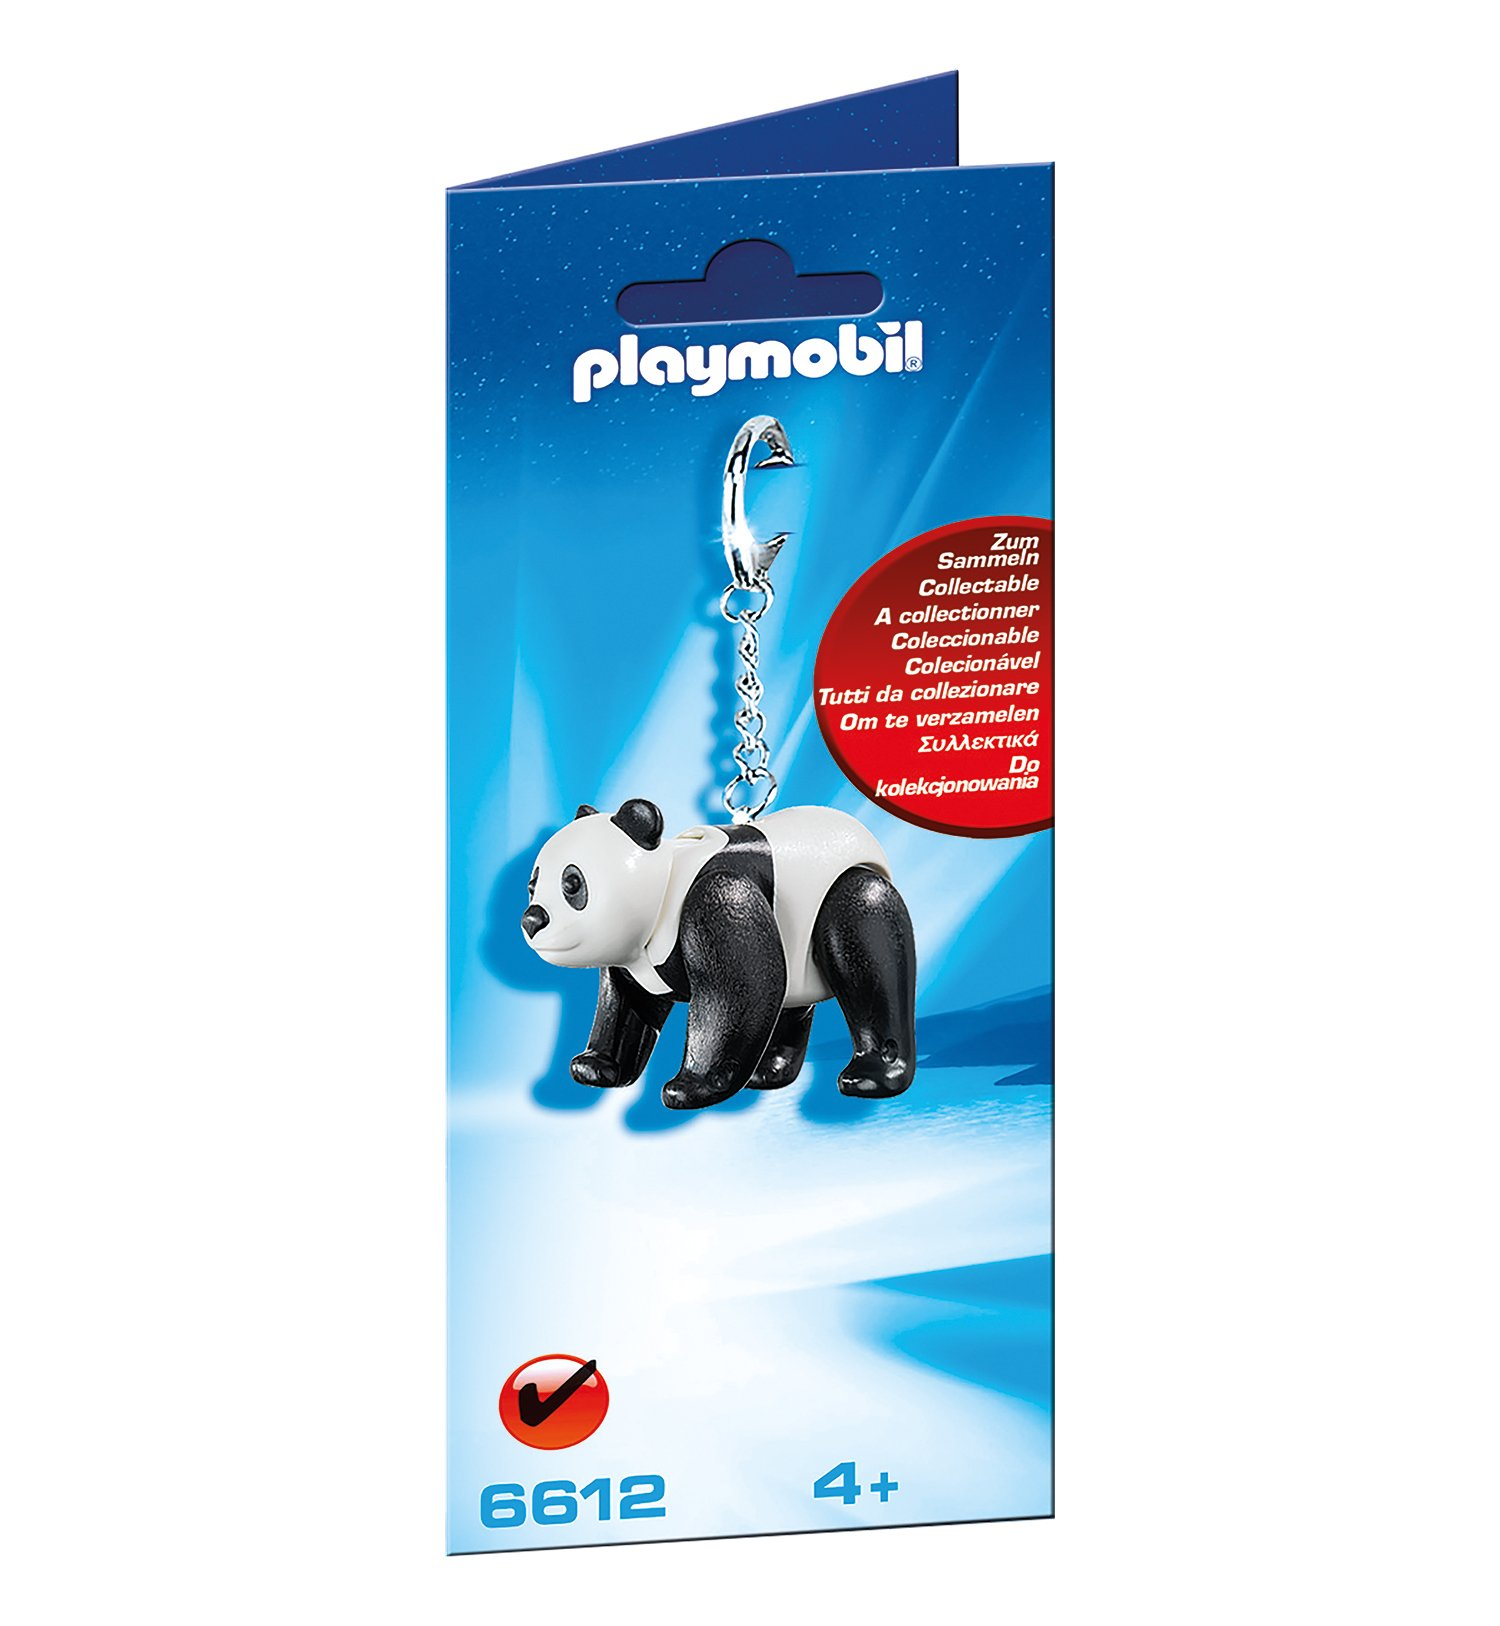 Playmobil 6612 City Life Zoo Panda Keyring